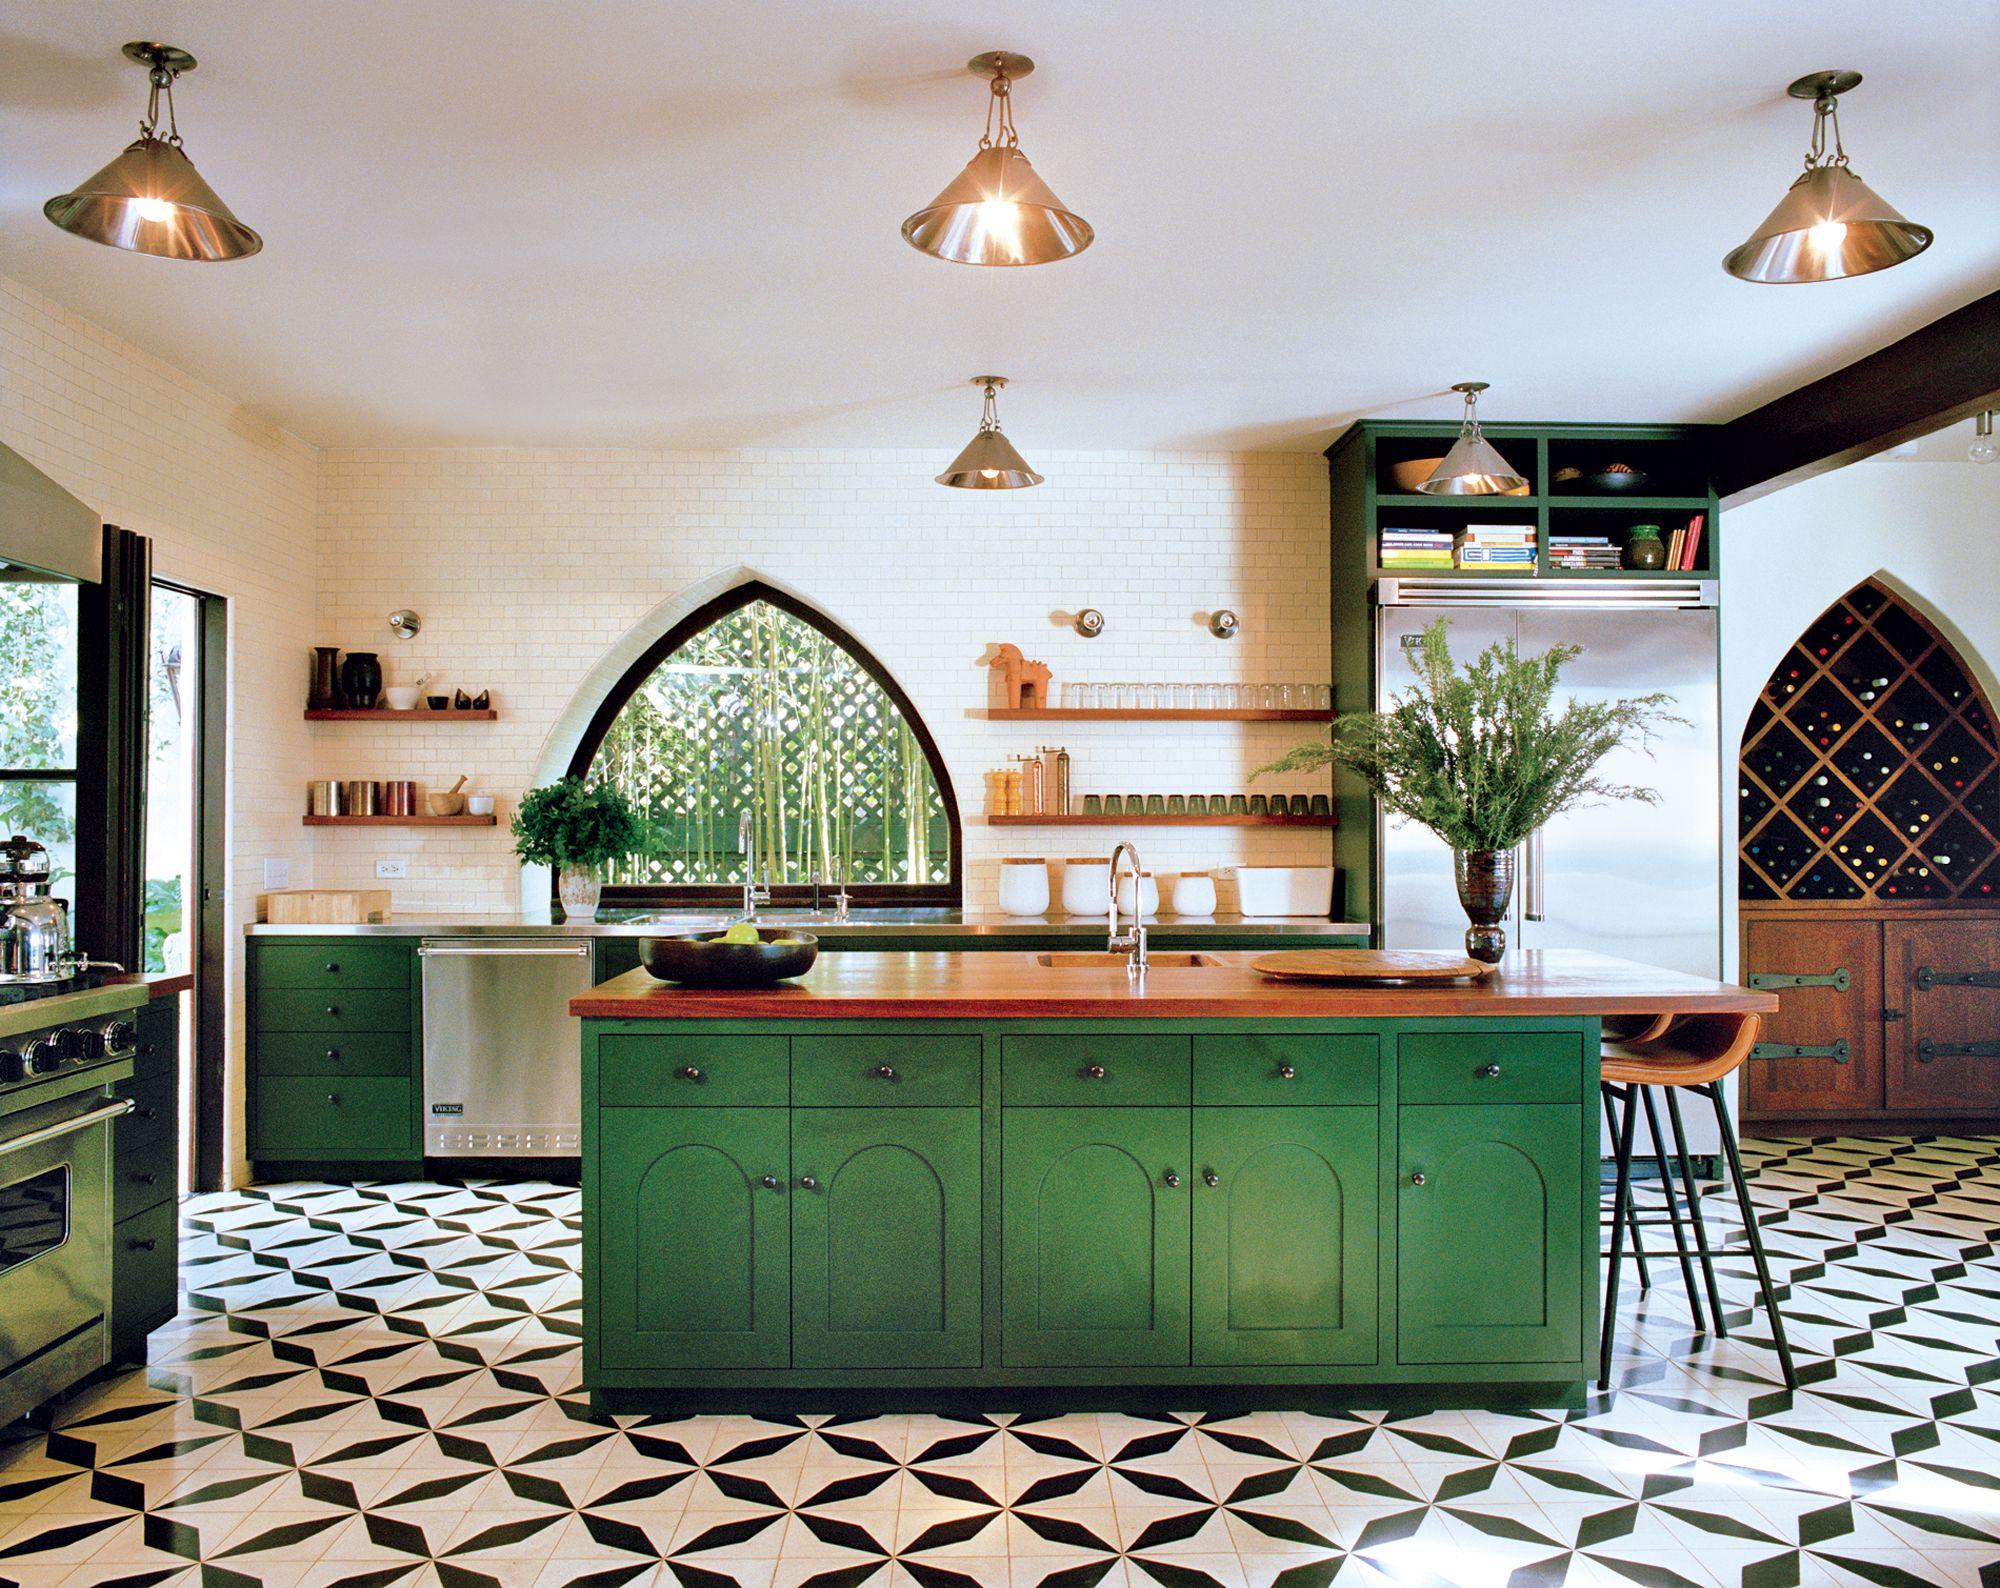 the 32 most beautiful kitchens in green kitchen decor green kitchen cabinets kitchen interior on kitchen interior green id=66013